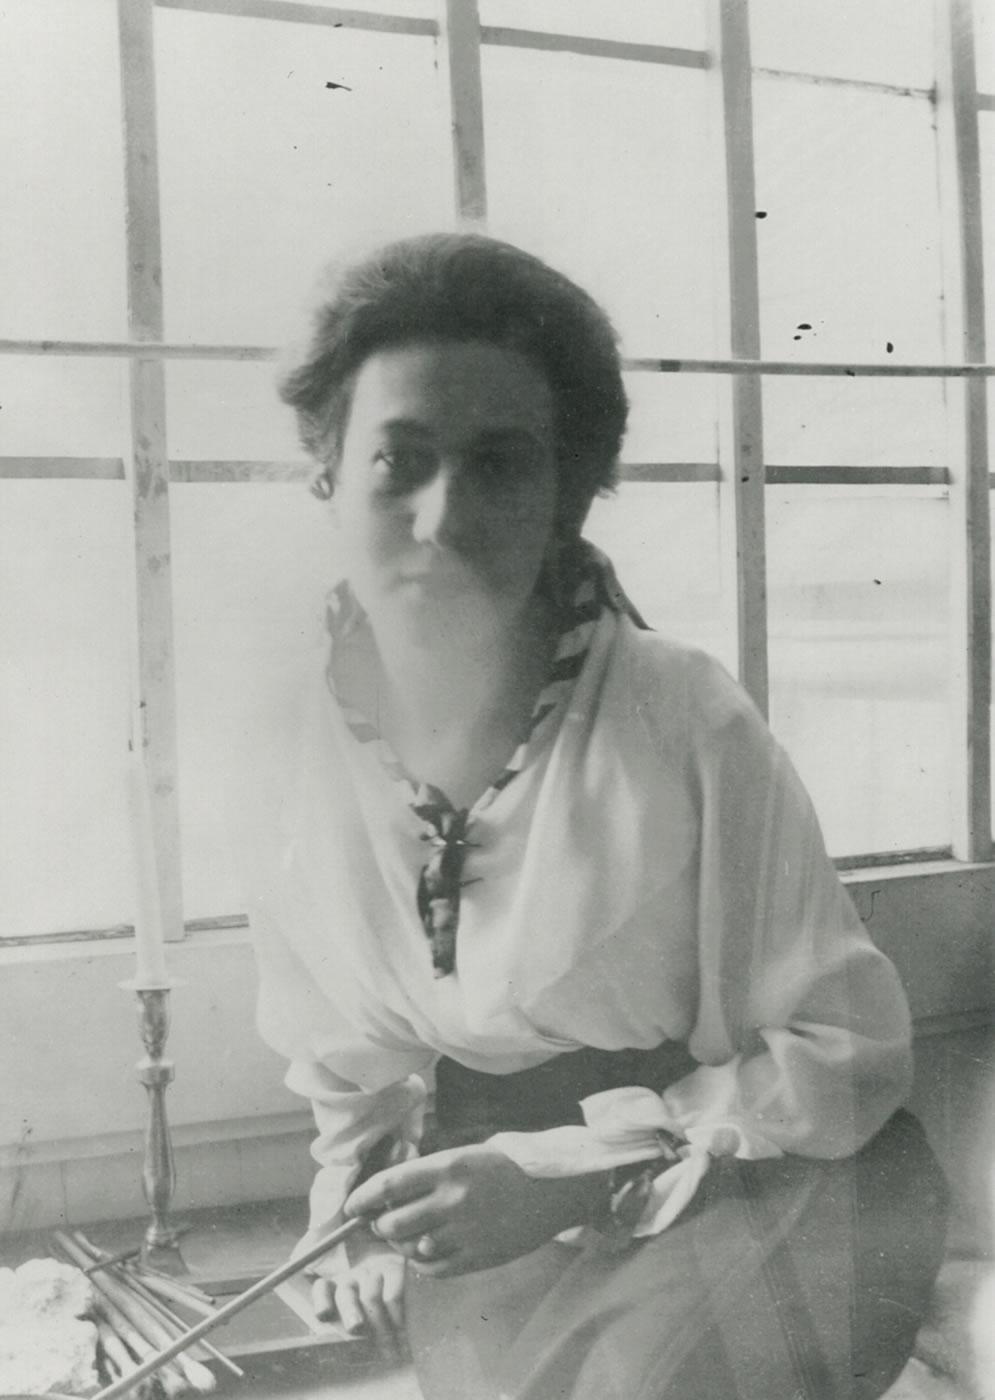 Emmy Esther Scheyer, Brüssel, circa 1915, Norton Simon Museum, The Blue Four Galka Scheyer Collection Archives, Pasadena, California